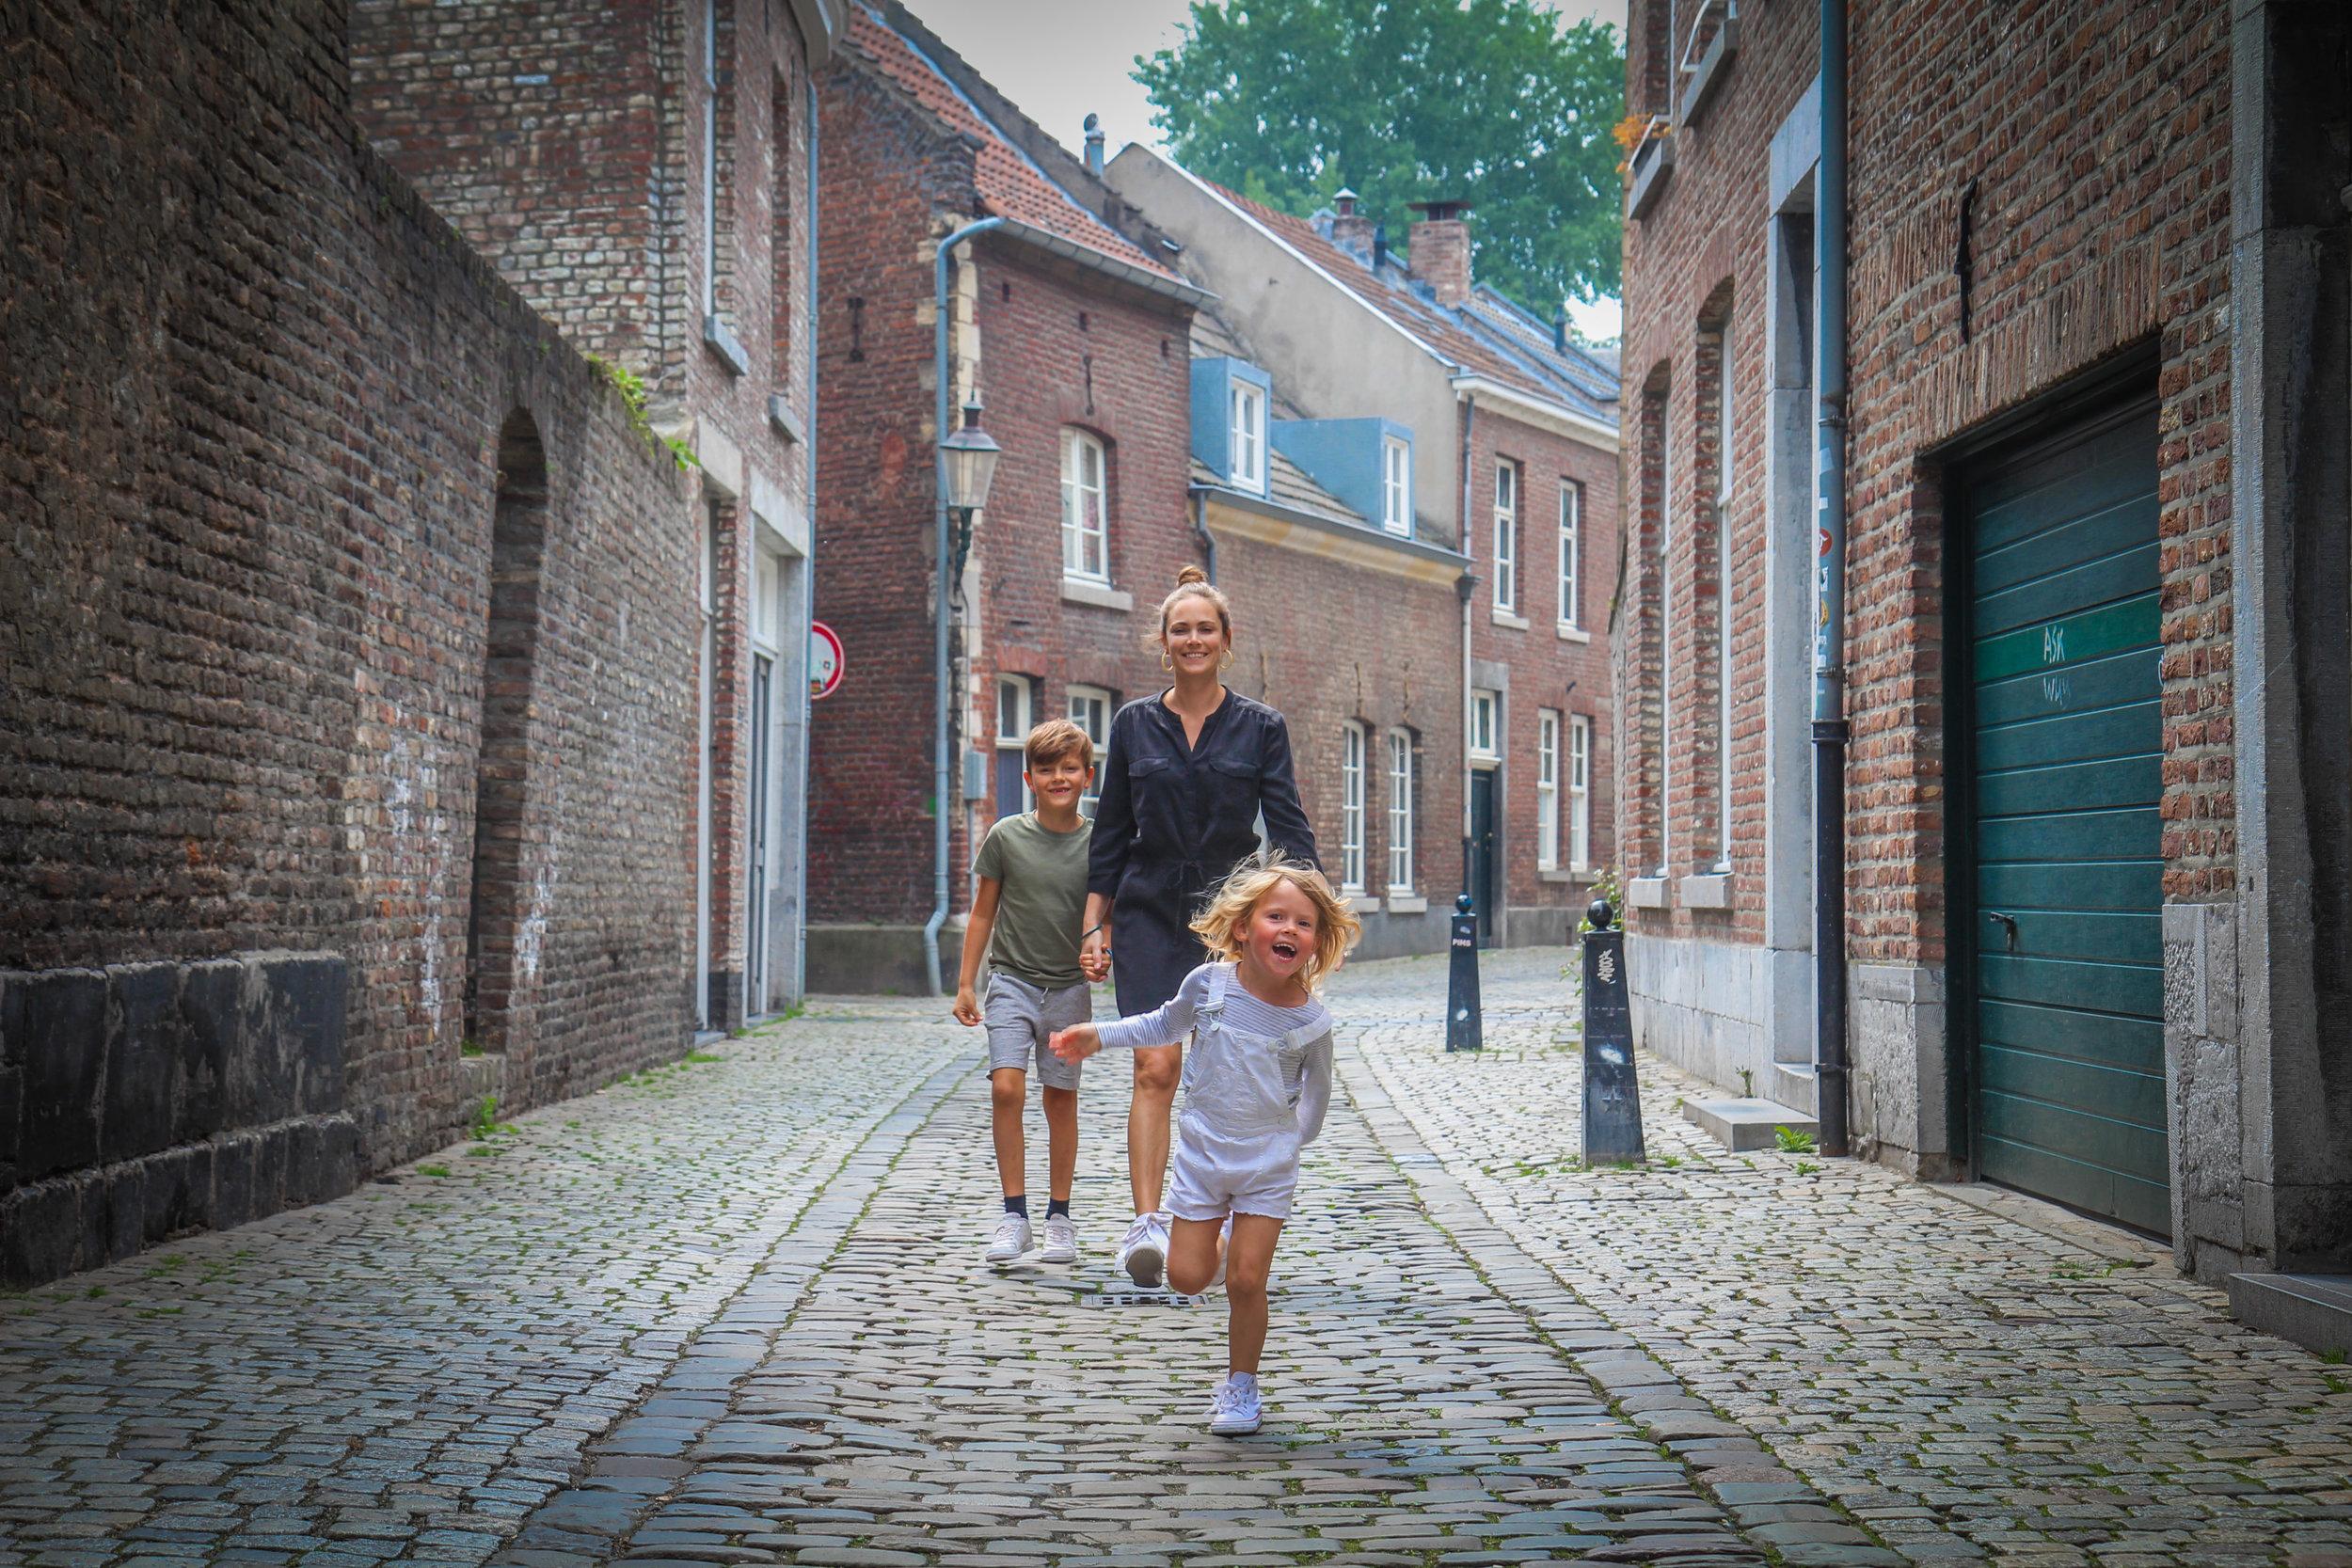 Maastricht_withkidsontheroad-6.jpg